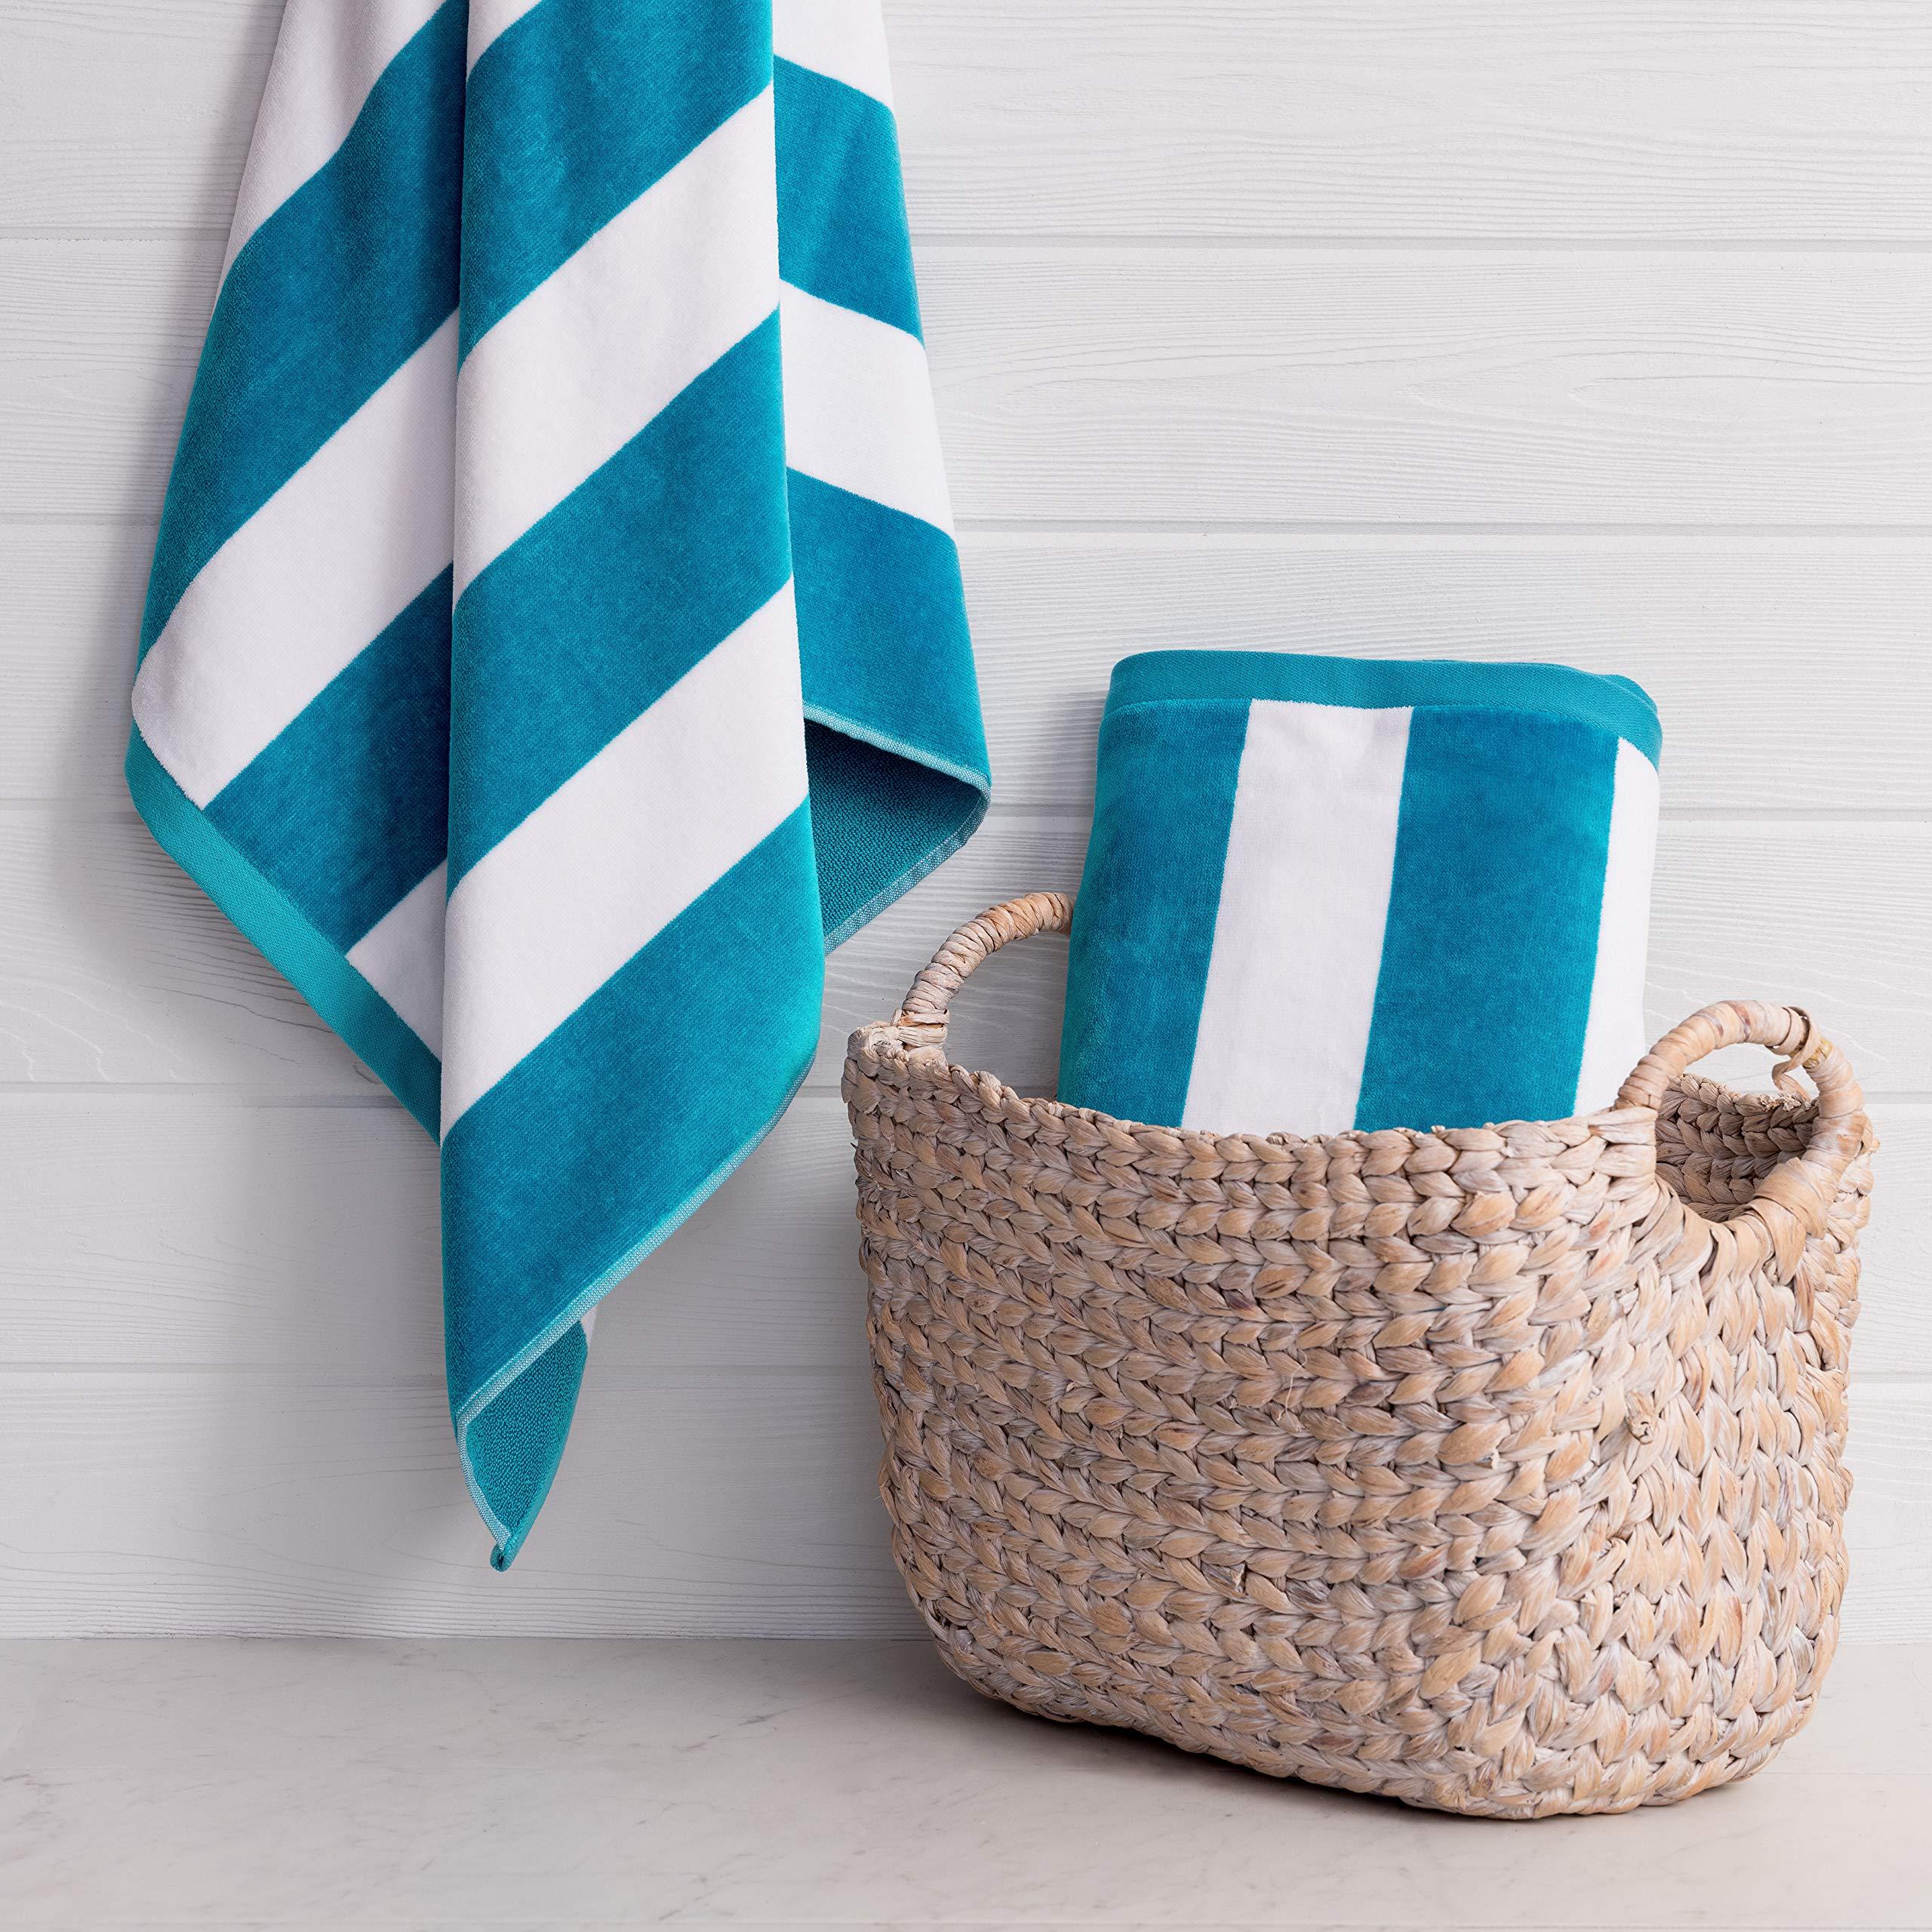 Welhome Cabana Beach Towel - Set of 2-100% Turkish Cotton - Oversize Towels 40''x72'' - Pool & Beach - Supersoft - Ultra Absorbent - Quick Dry - Machine Washable - 450 GSM - Deep Aqua